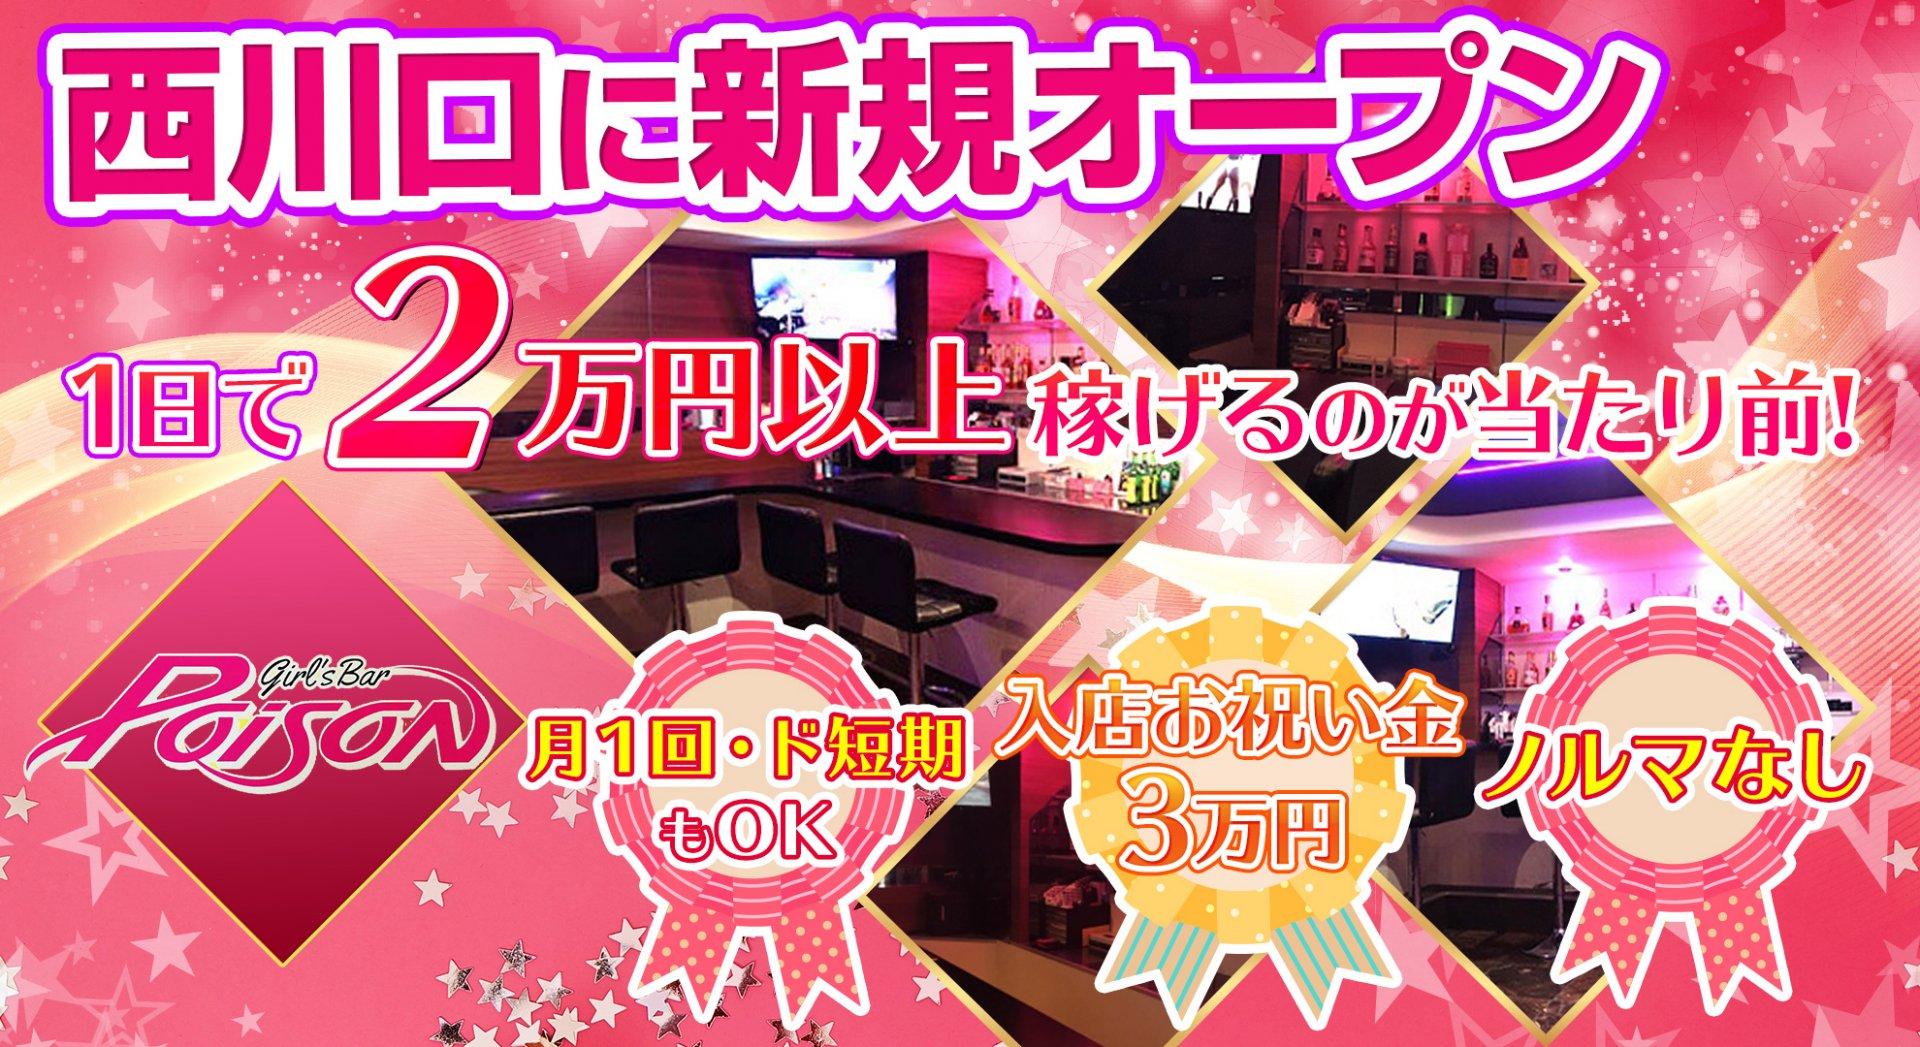 GIRL'S BAR GIMMIC<ギミック> 大宮 ガールズバー TOP画像